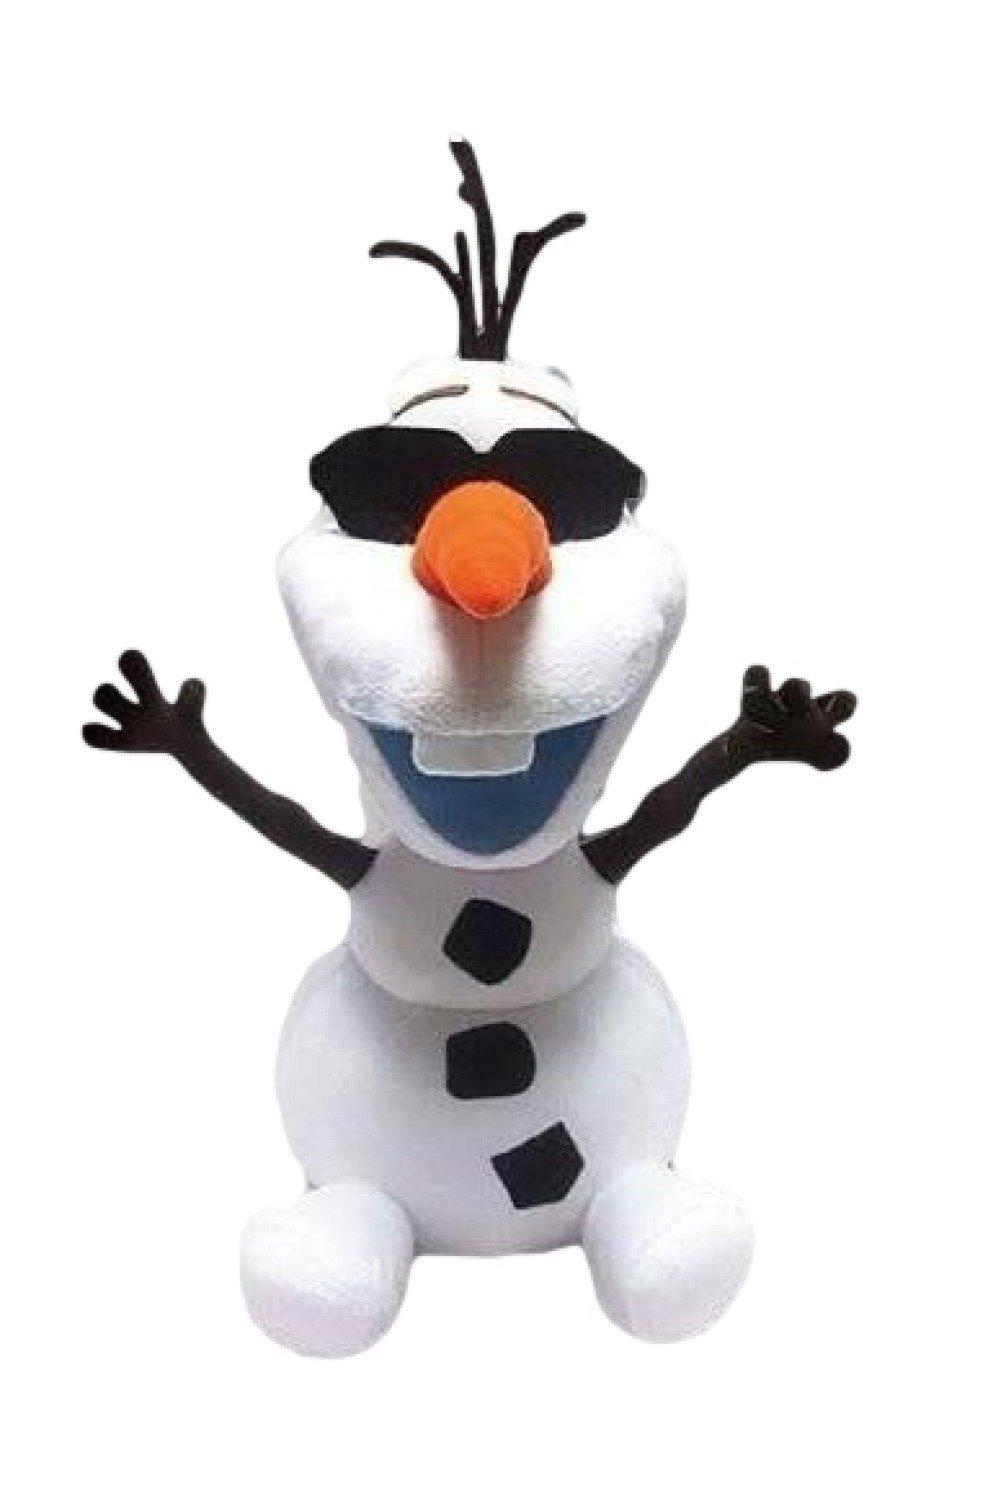 "Disney Japan. Frozen Soft Plush Smiling Olaf Wearing Sunglasses. Total 14"" H (37cm) .Limited Edition.Japan Import."